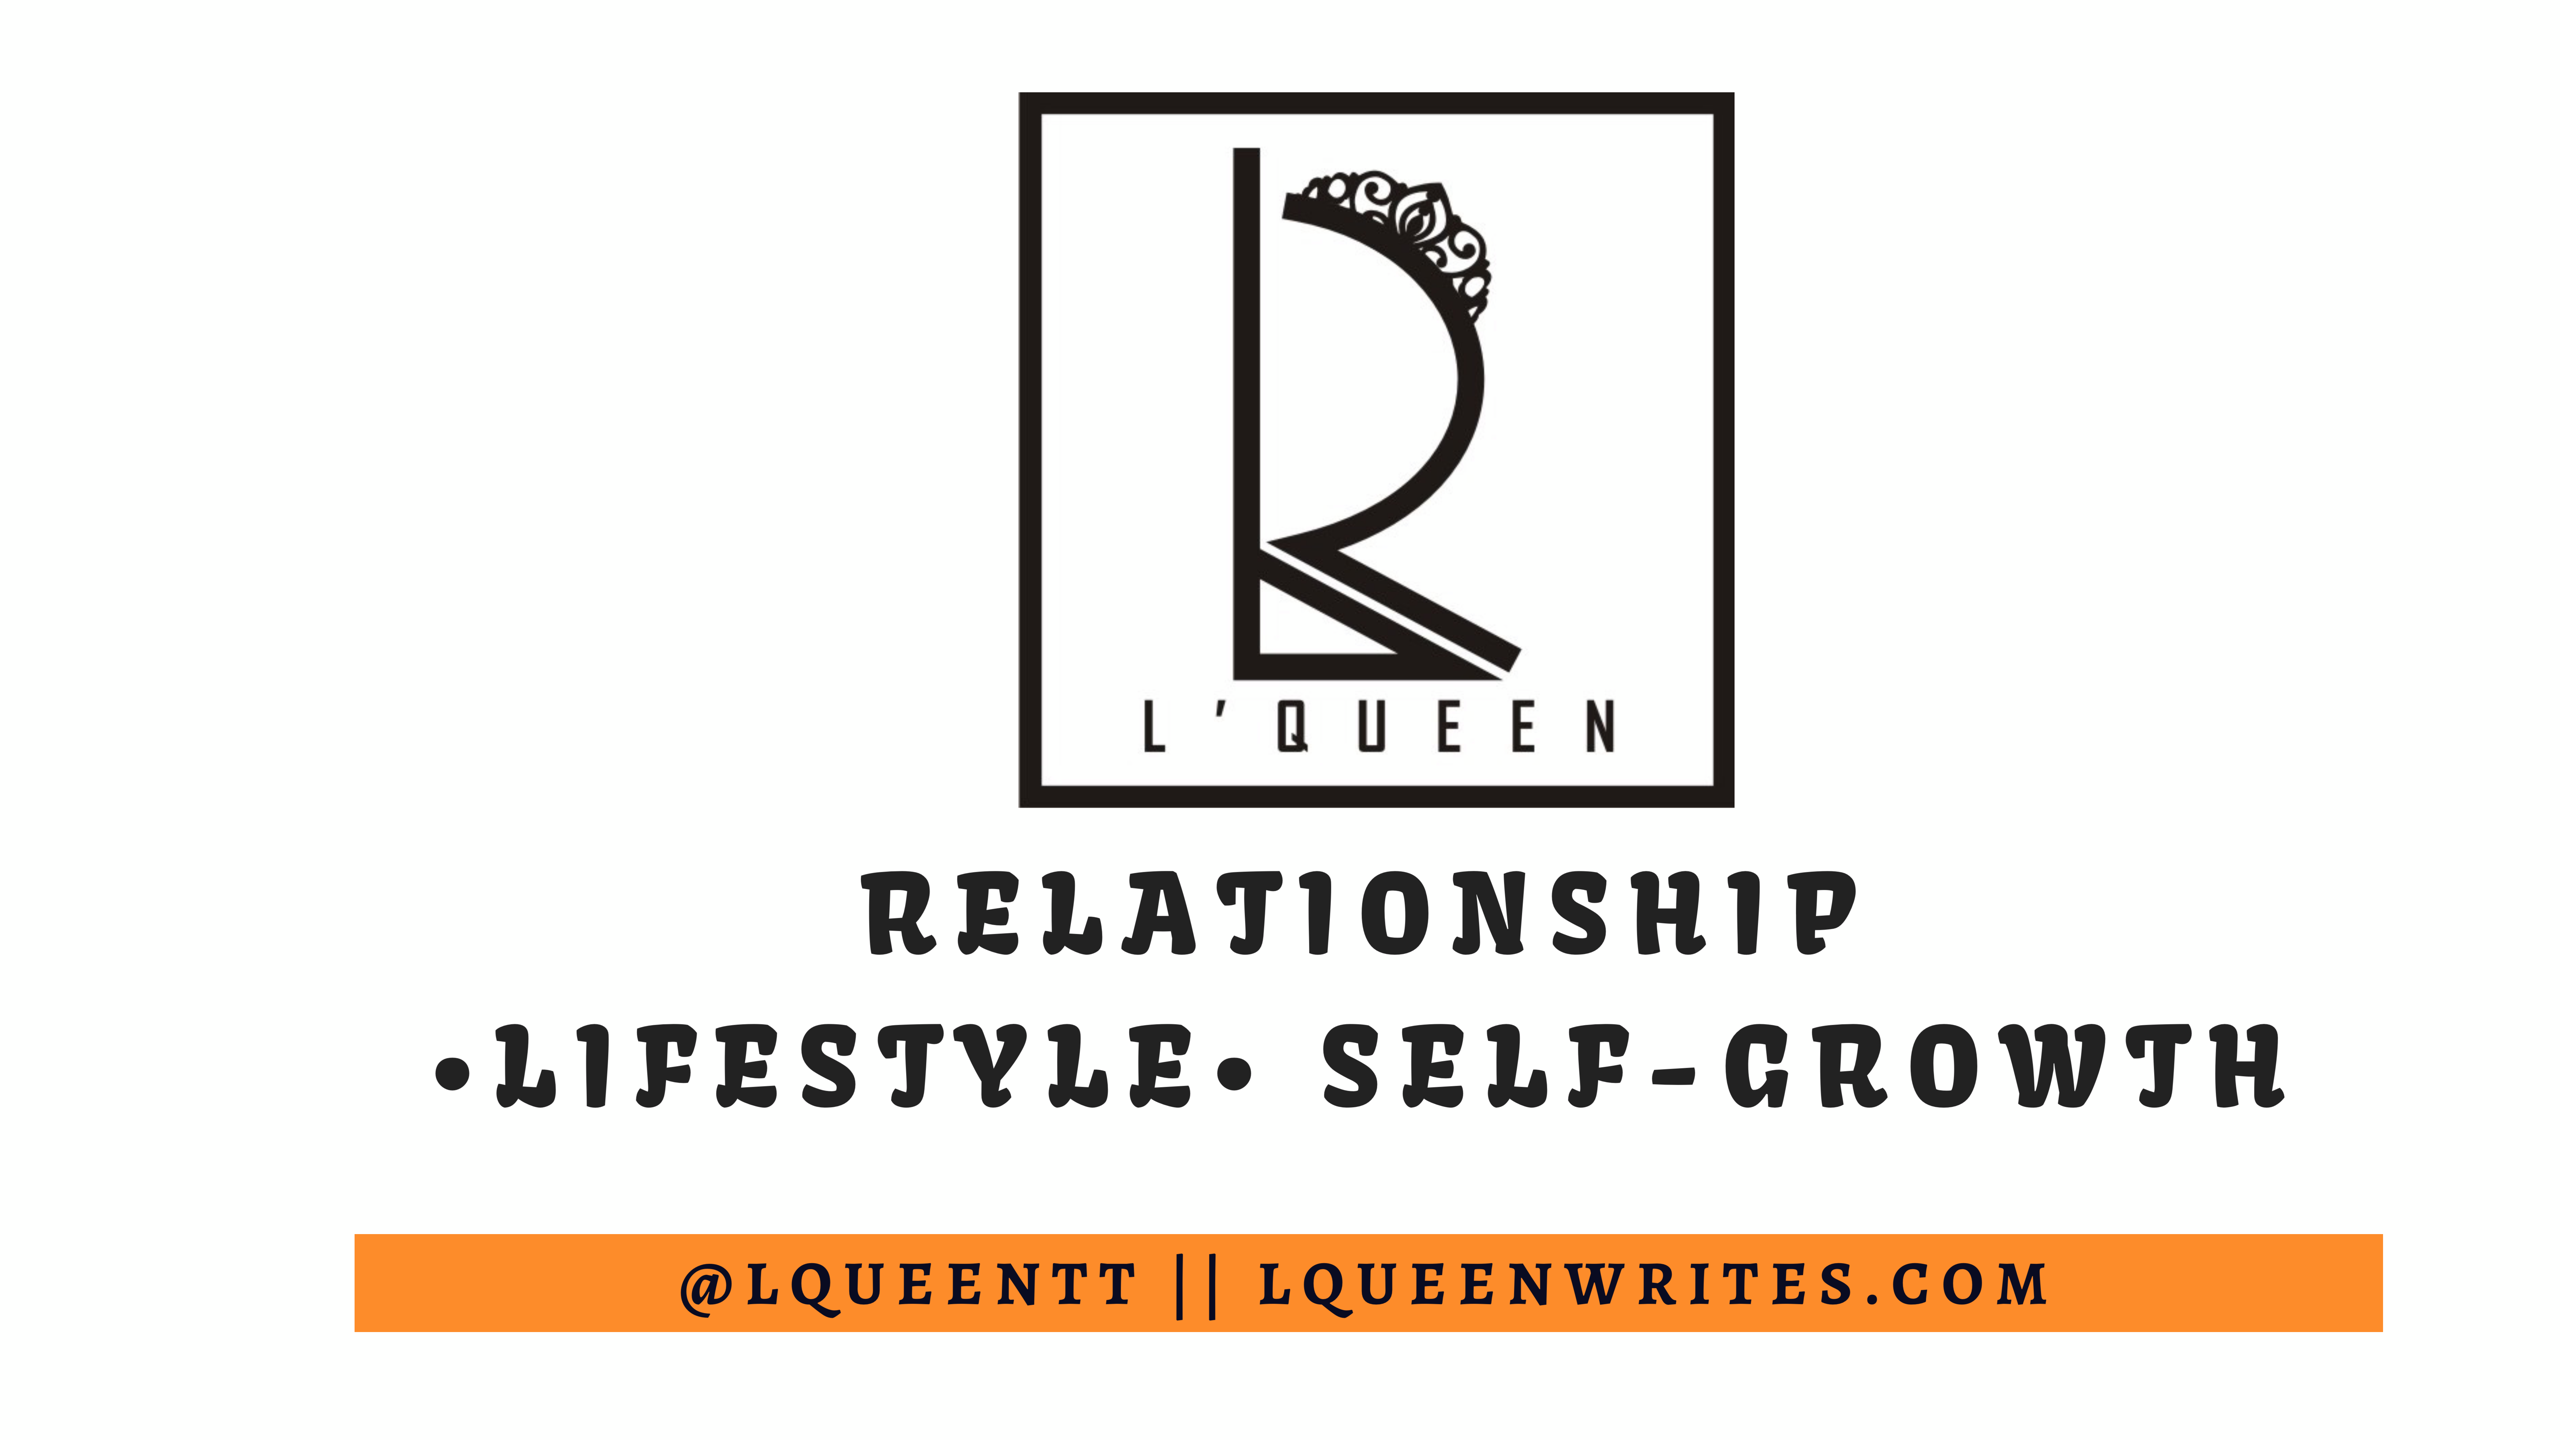 L'QUEEN WRITES